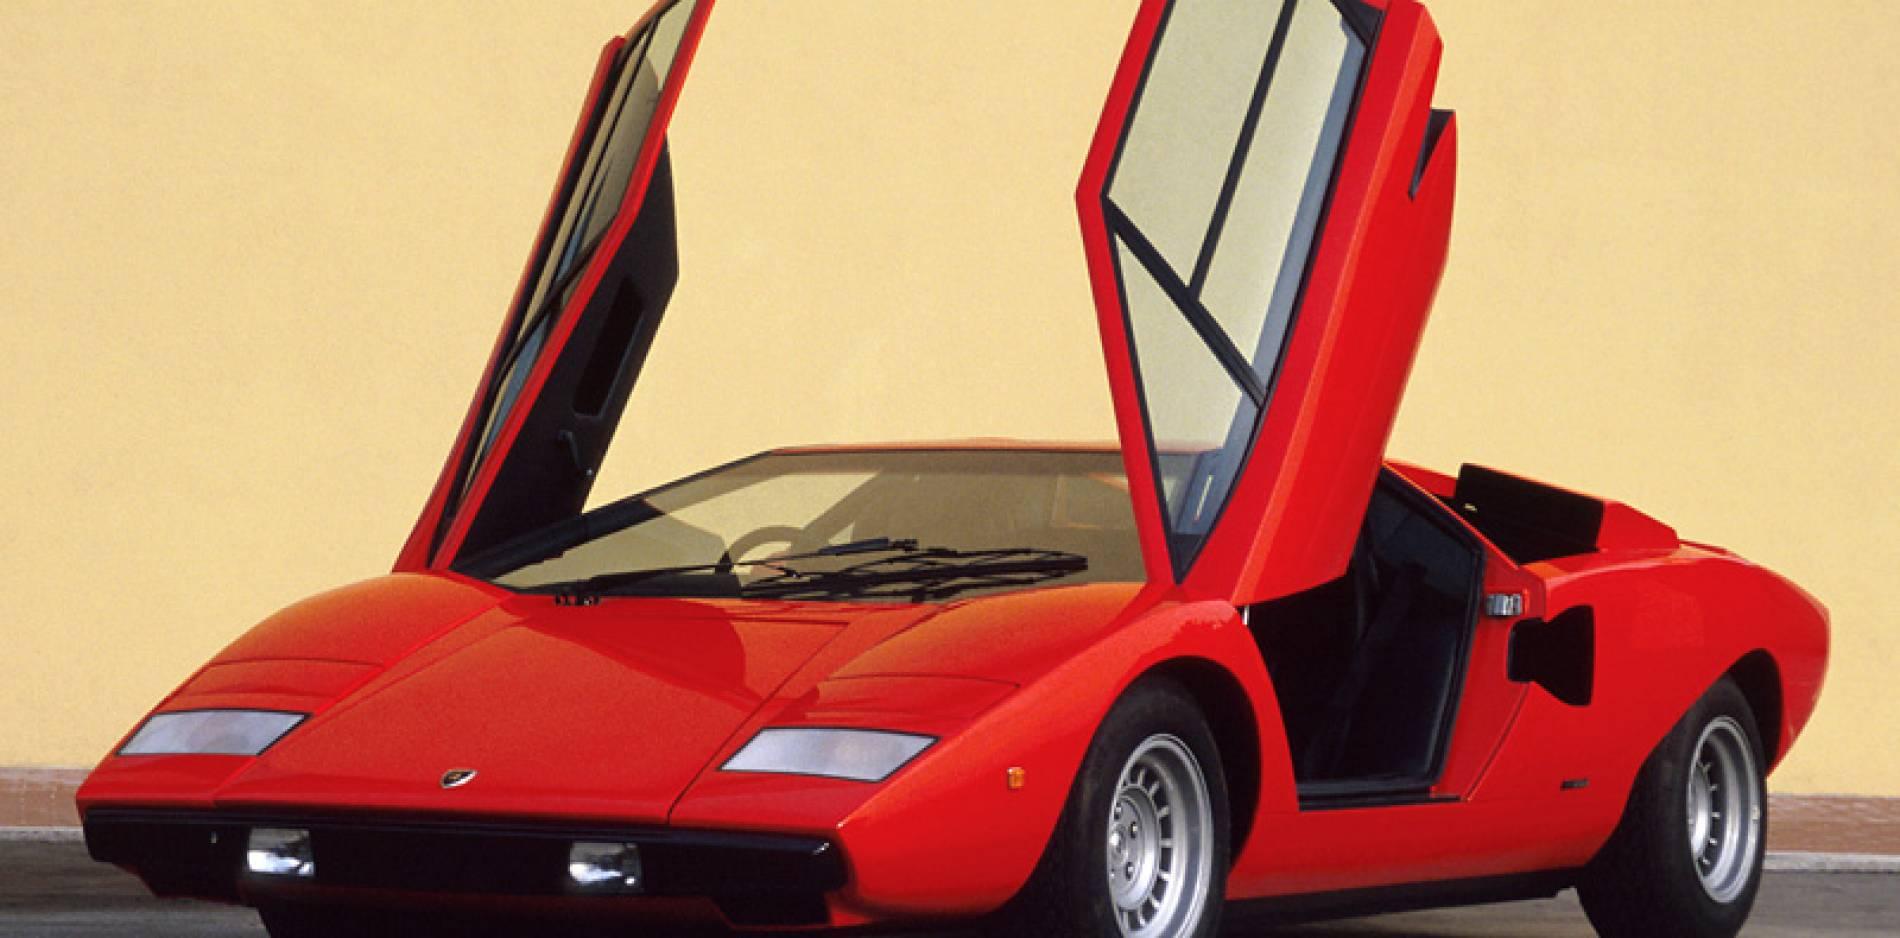 Génesis del Lamborghini Countach: un poco de historia